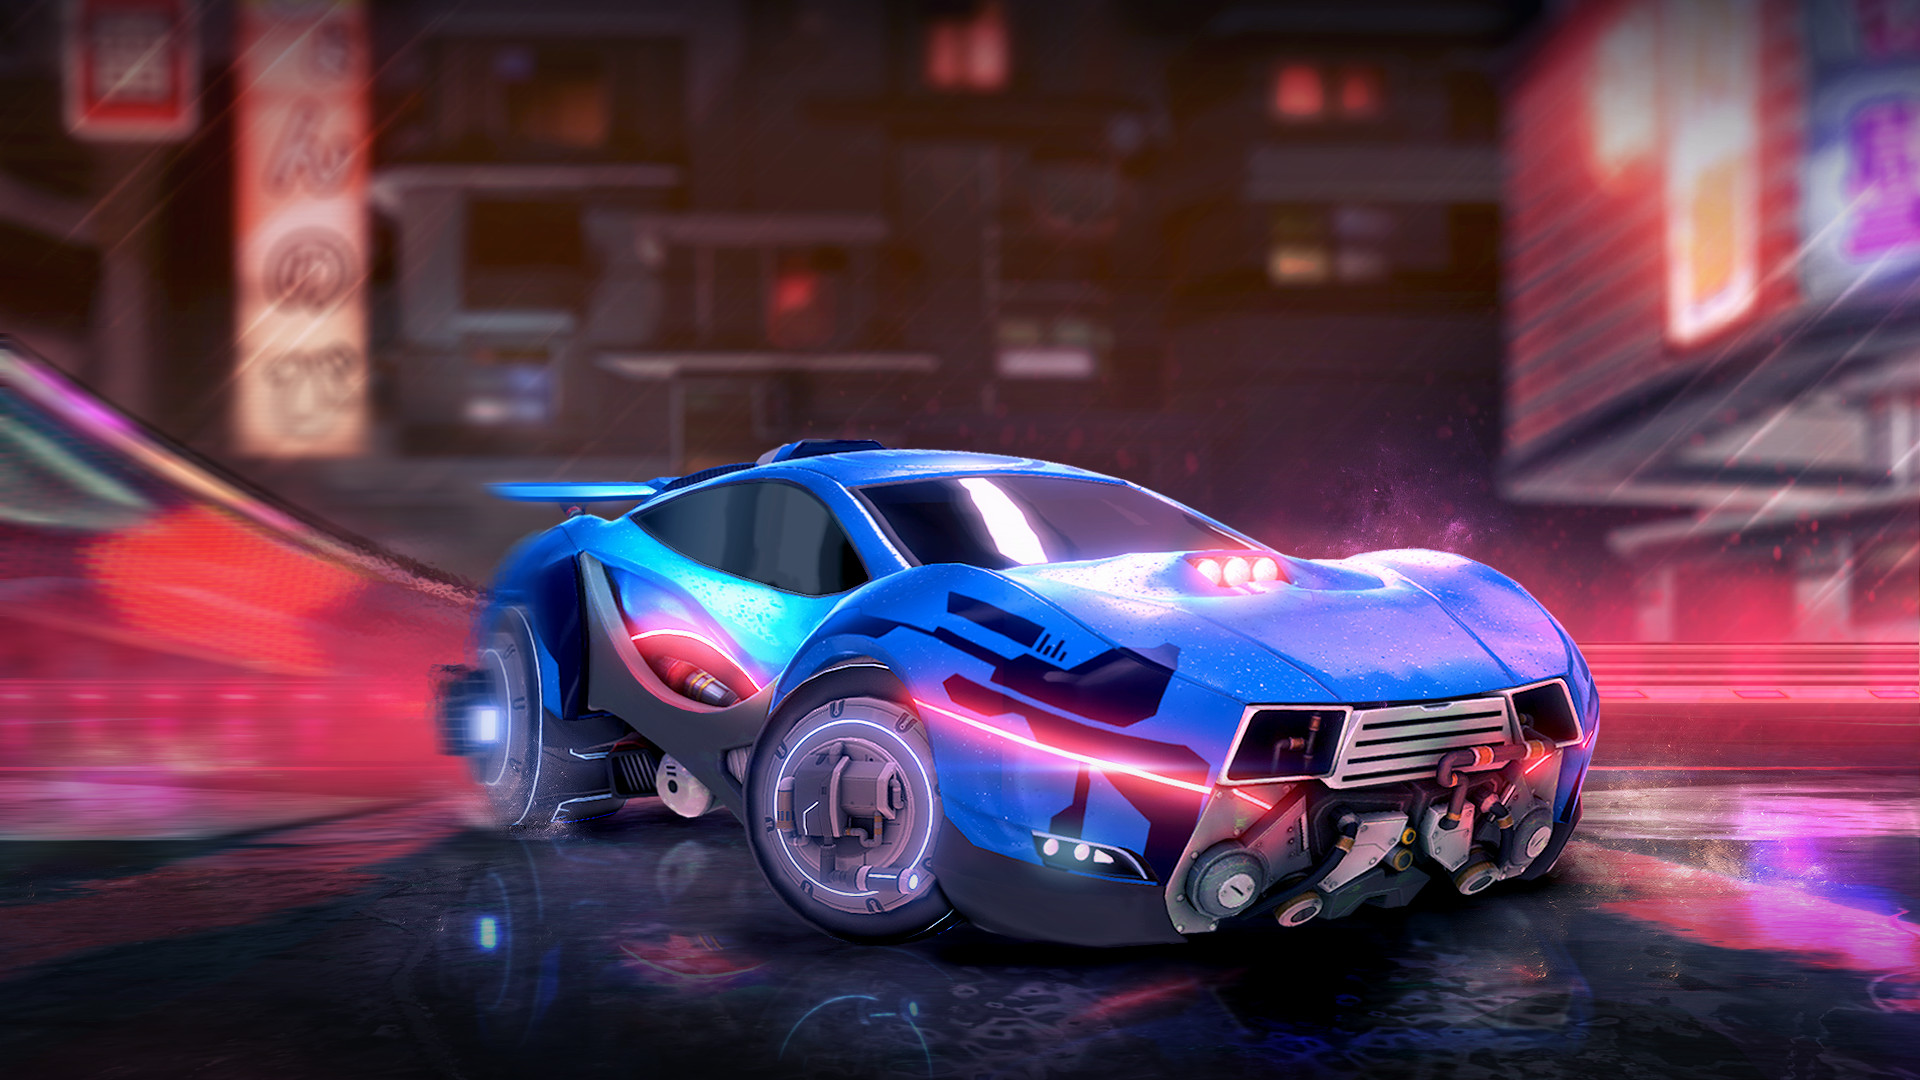 Rocket League - Masamune screenshot